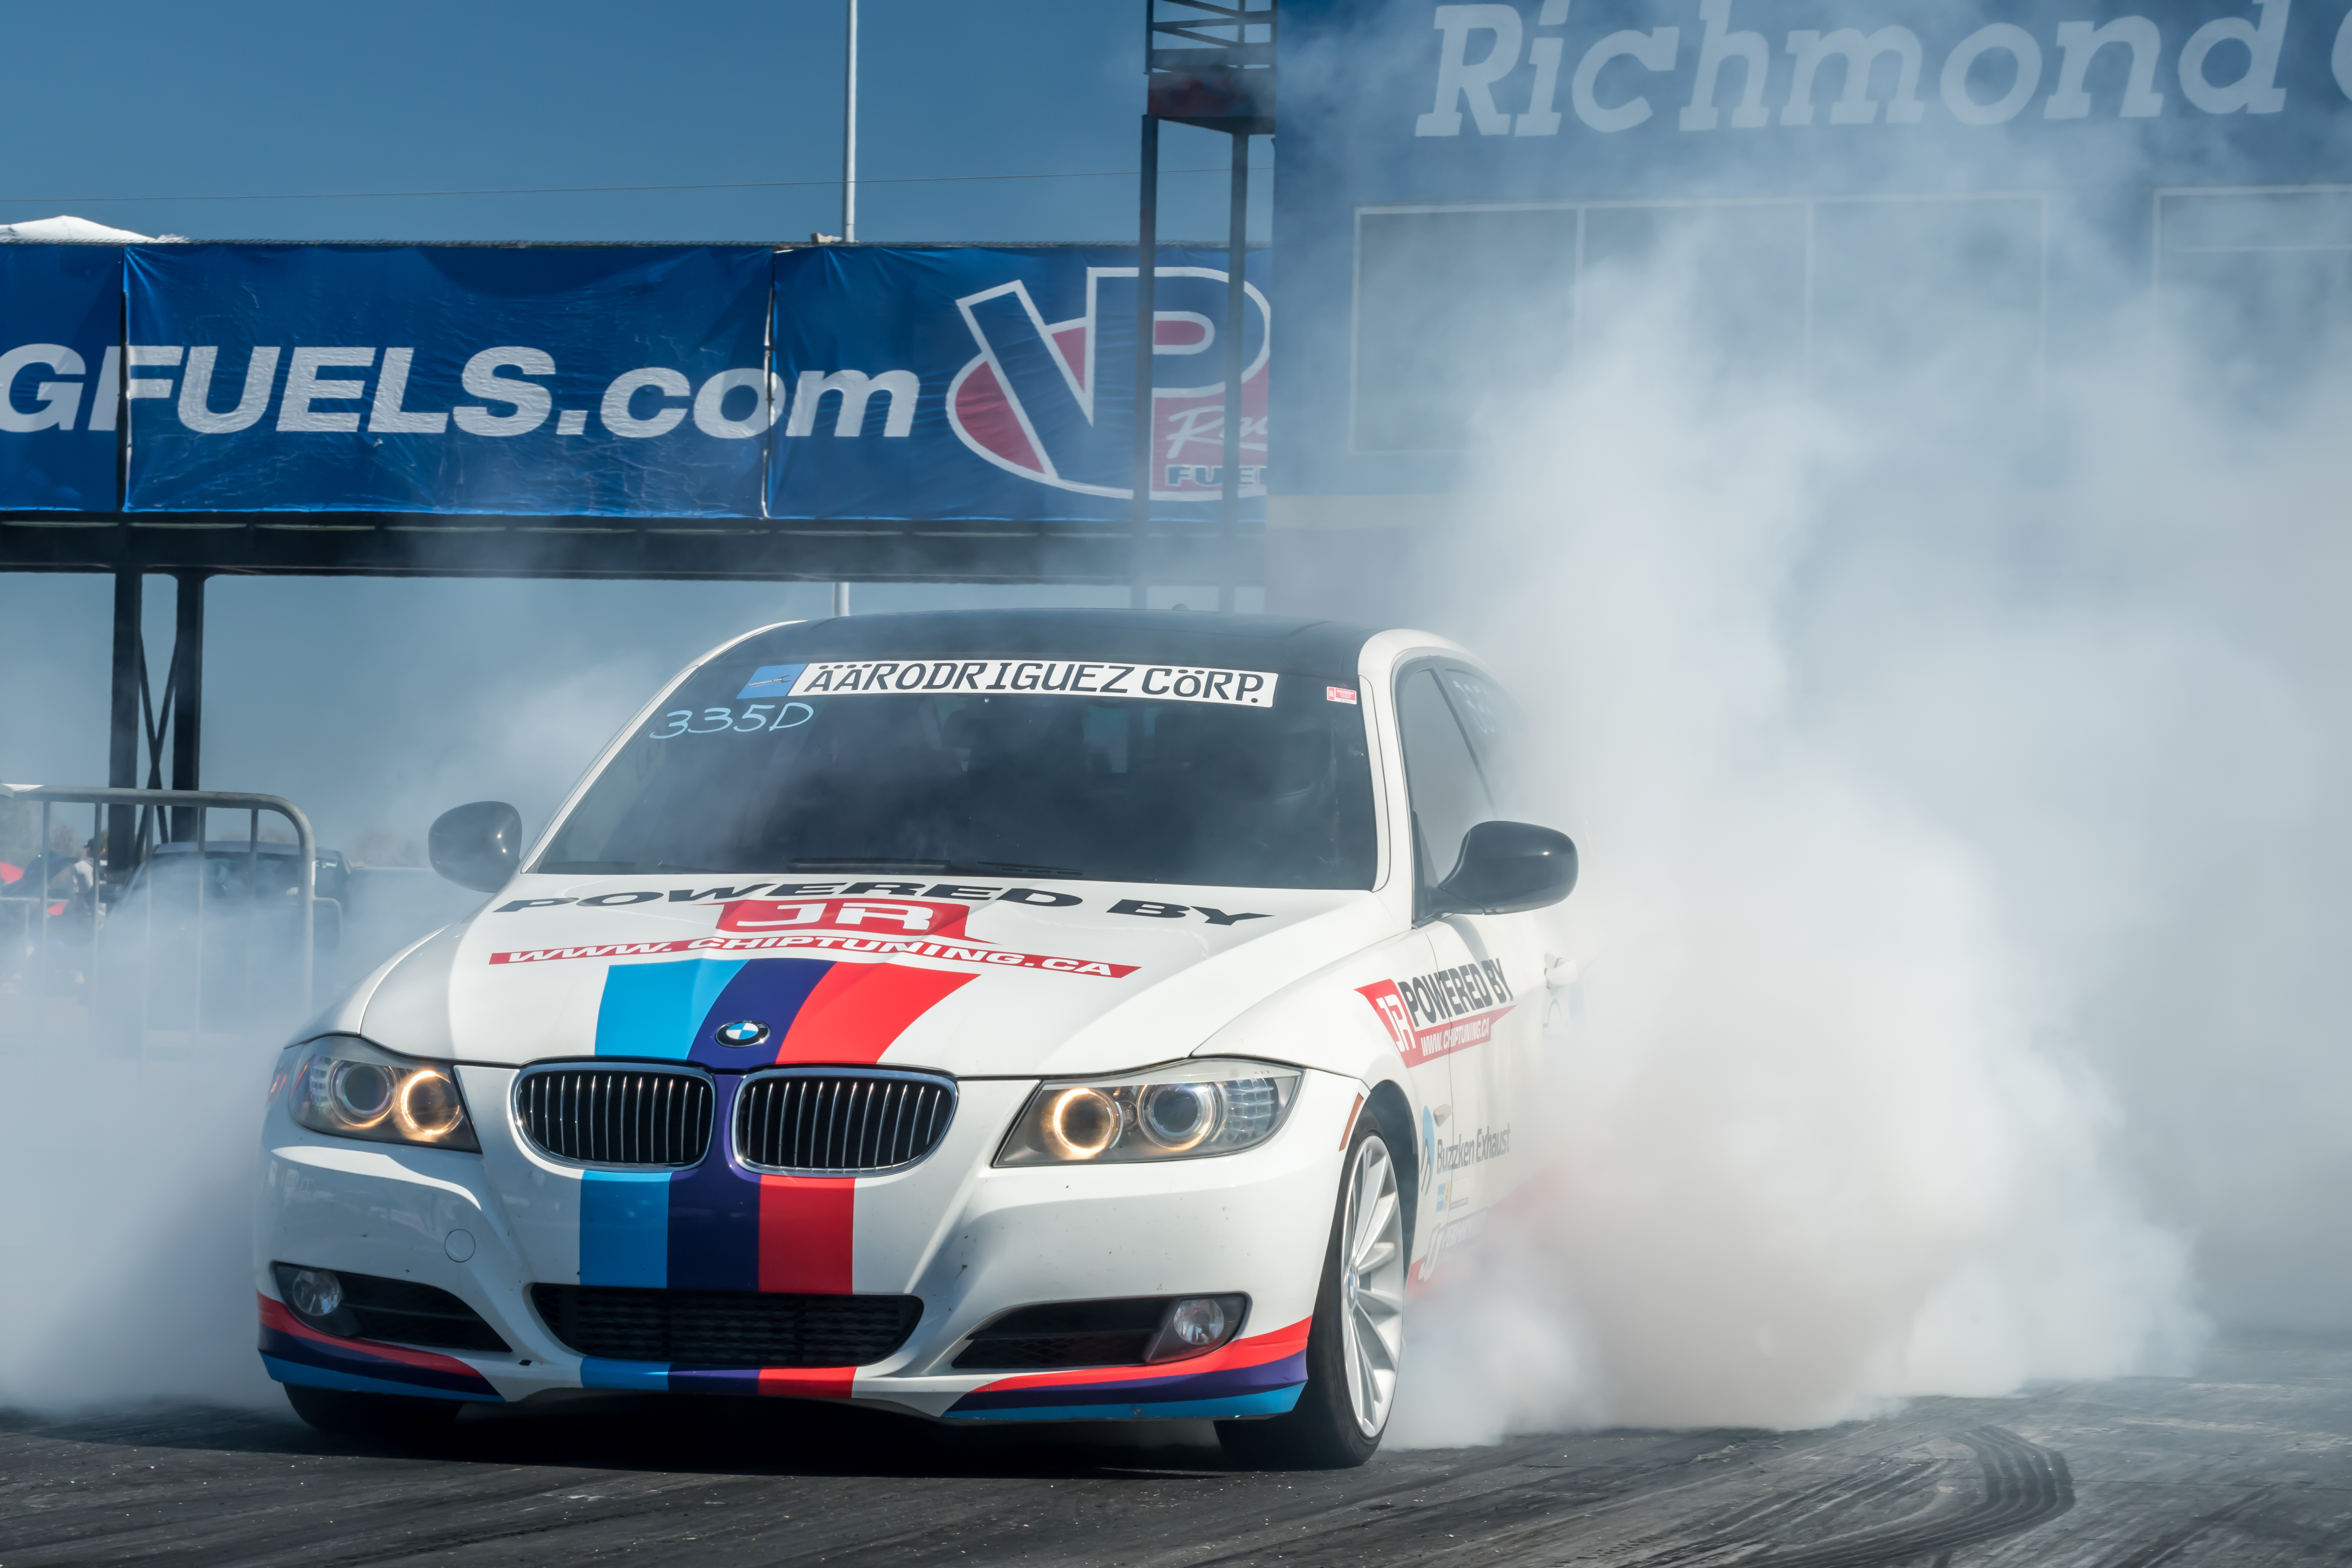 BMW 335D World Record 1/4 Mile